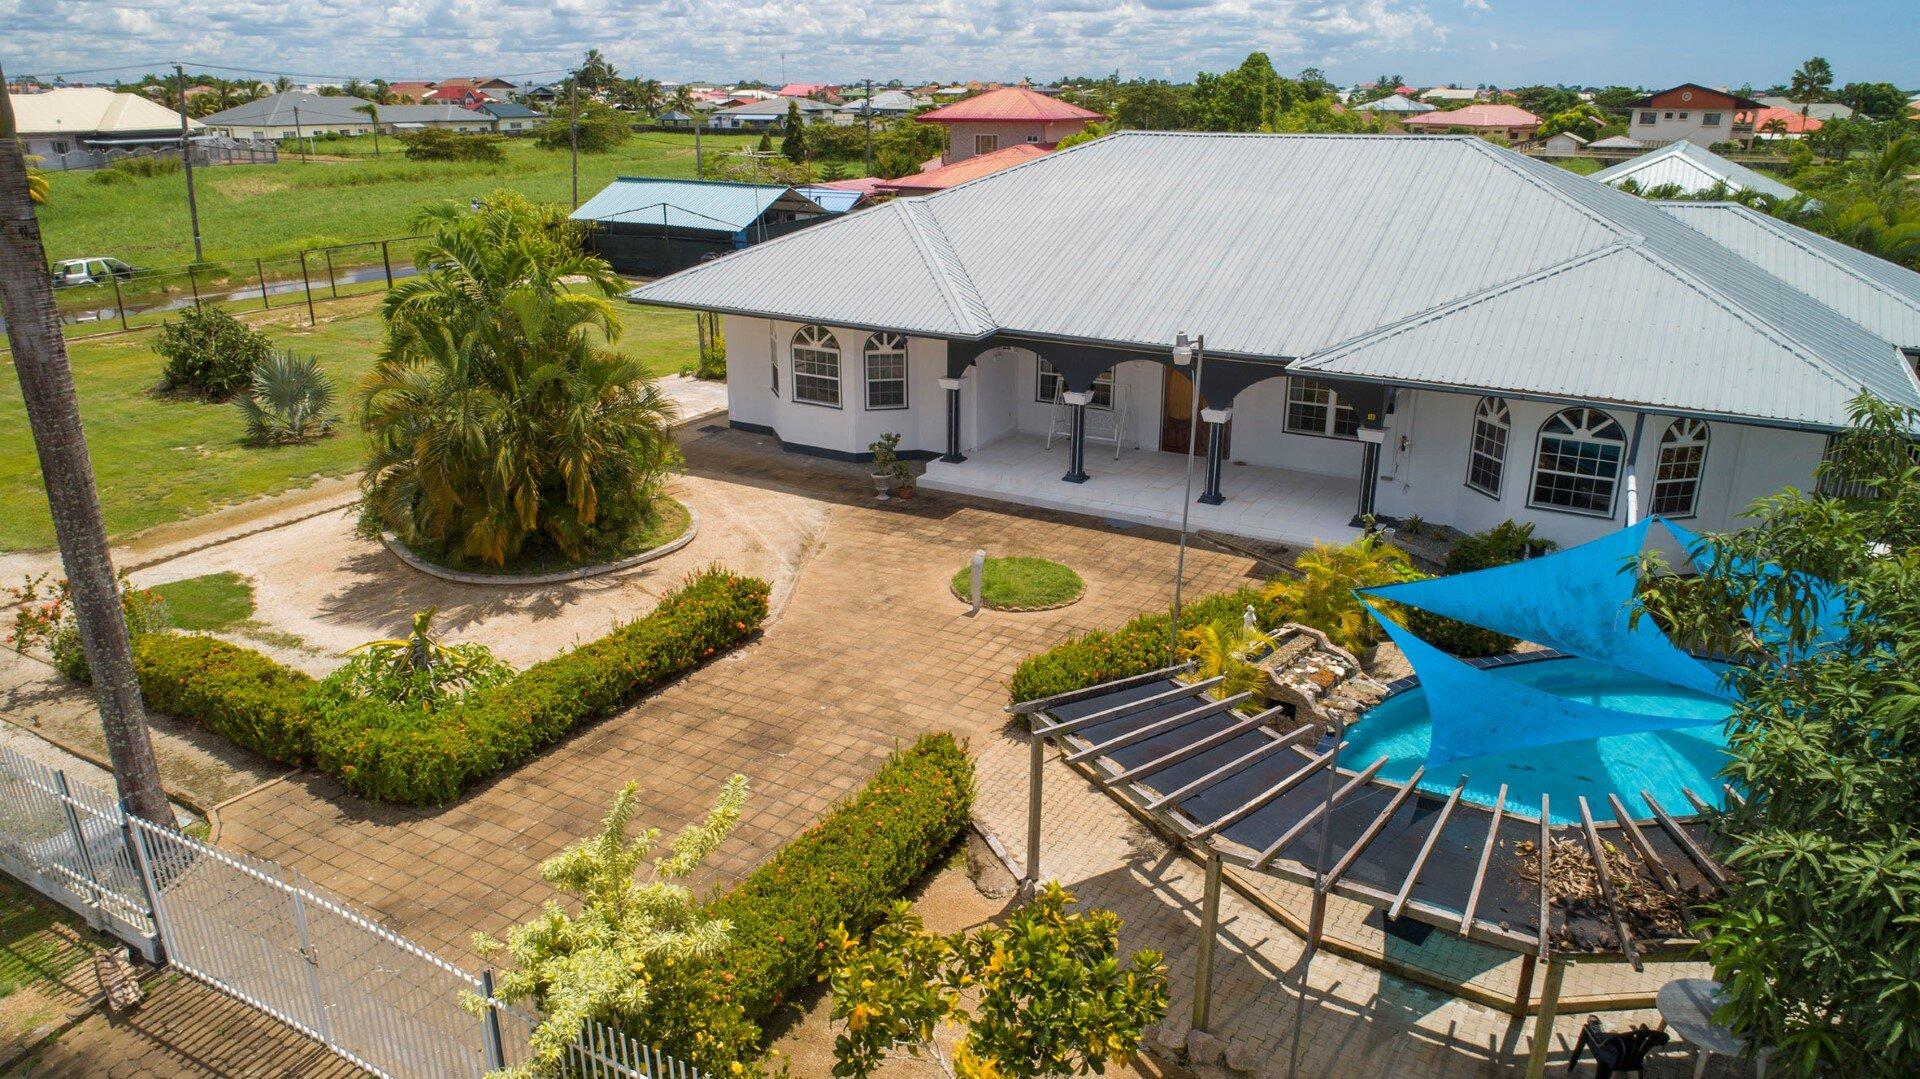 Zwembad bouwen in Suriname - Surgoed Bouw & Infra - Surgoed Makelaardij NV - Paramaribo, Suriname